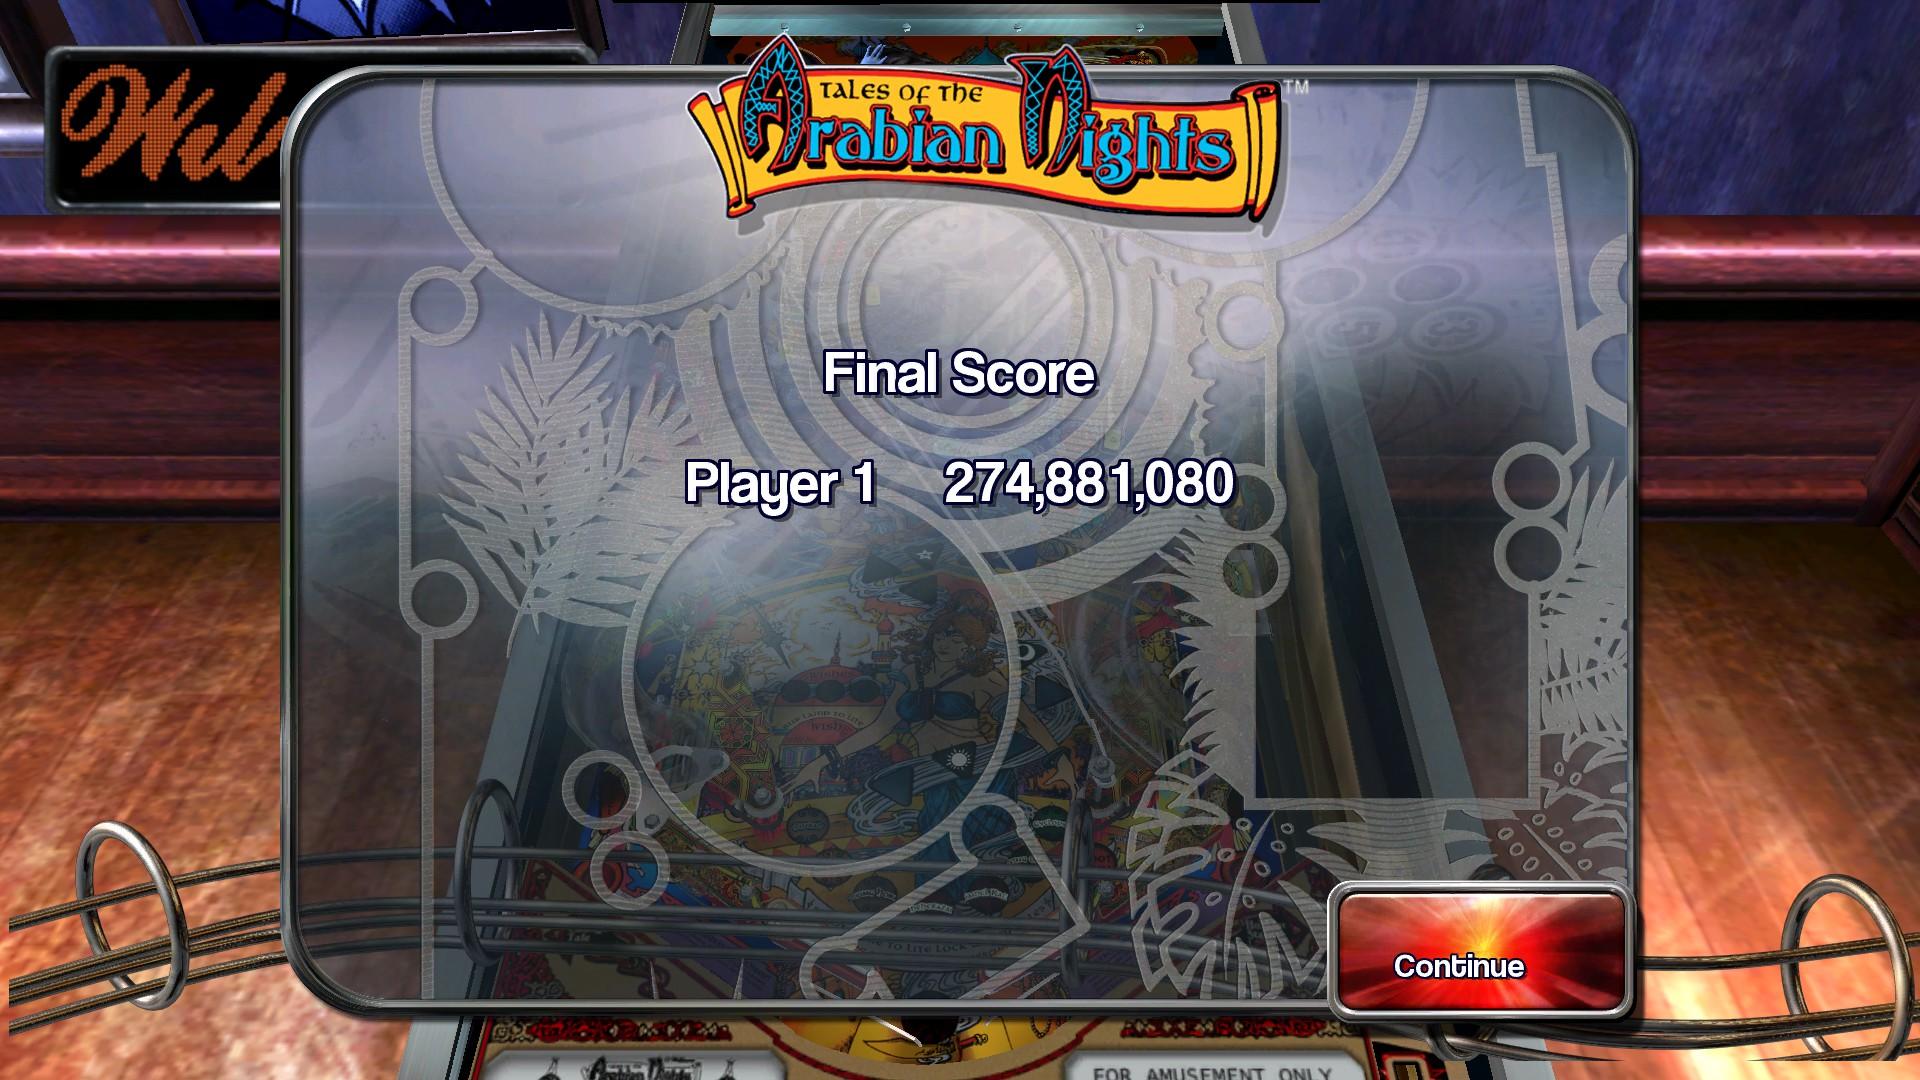 Pinball Arcade: Tales of the Arabian Nights [3 balls] 274,881,080 points